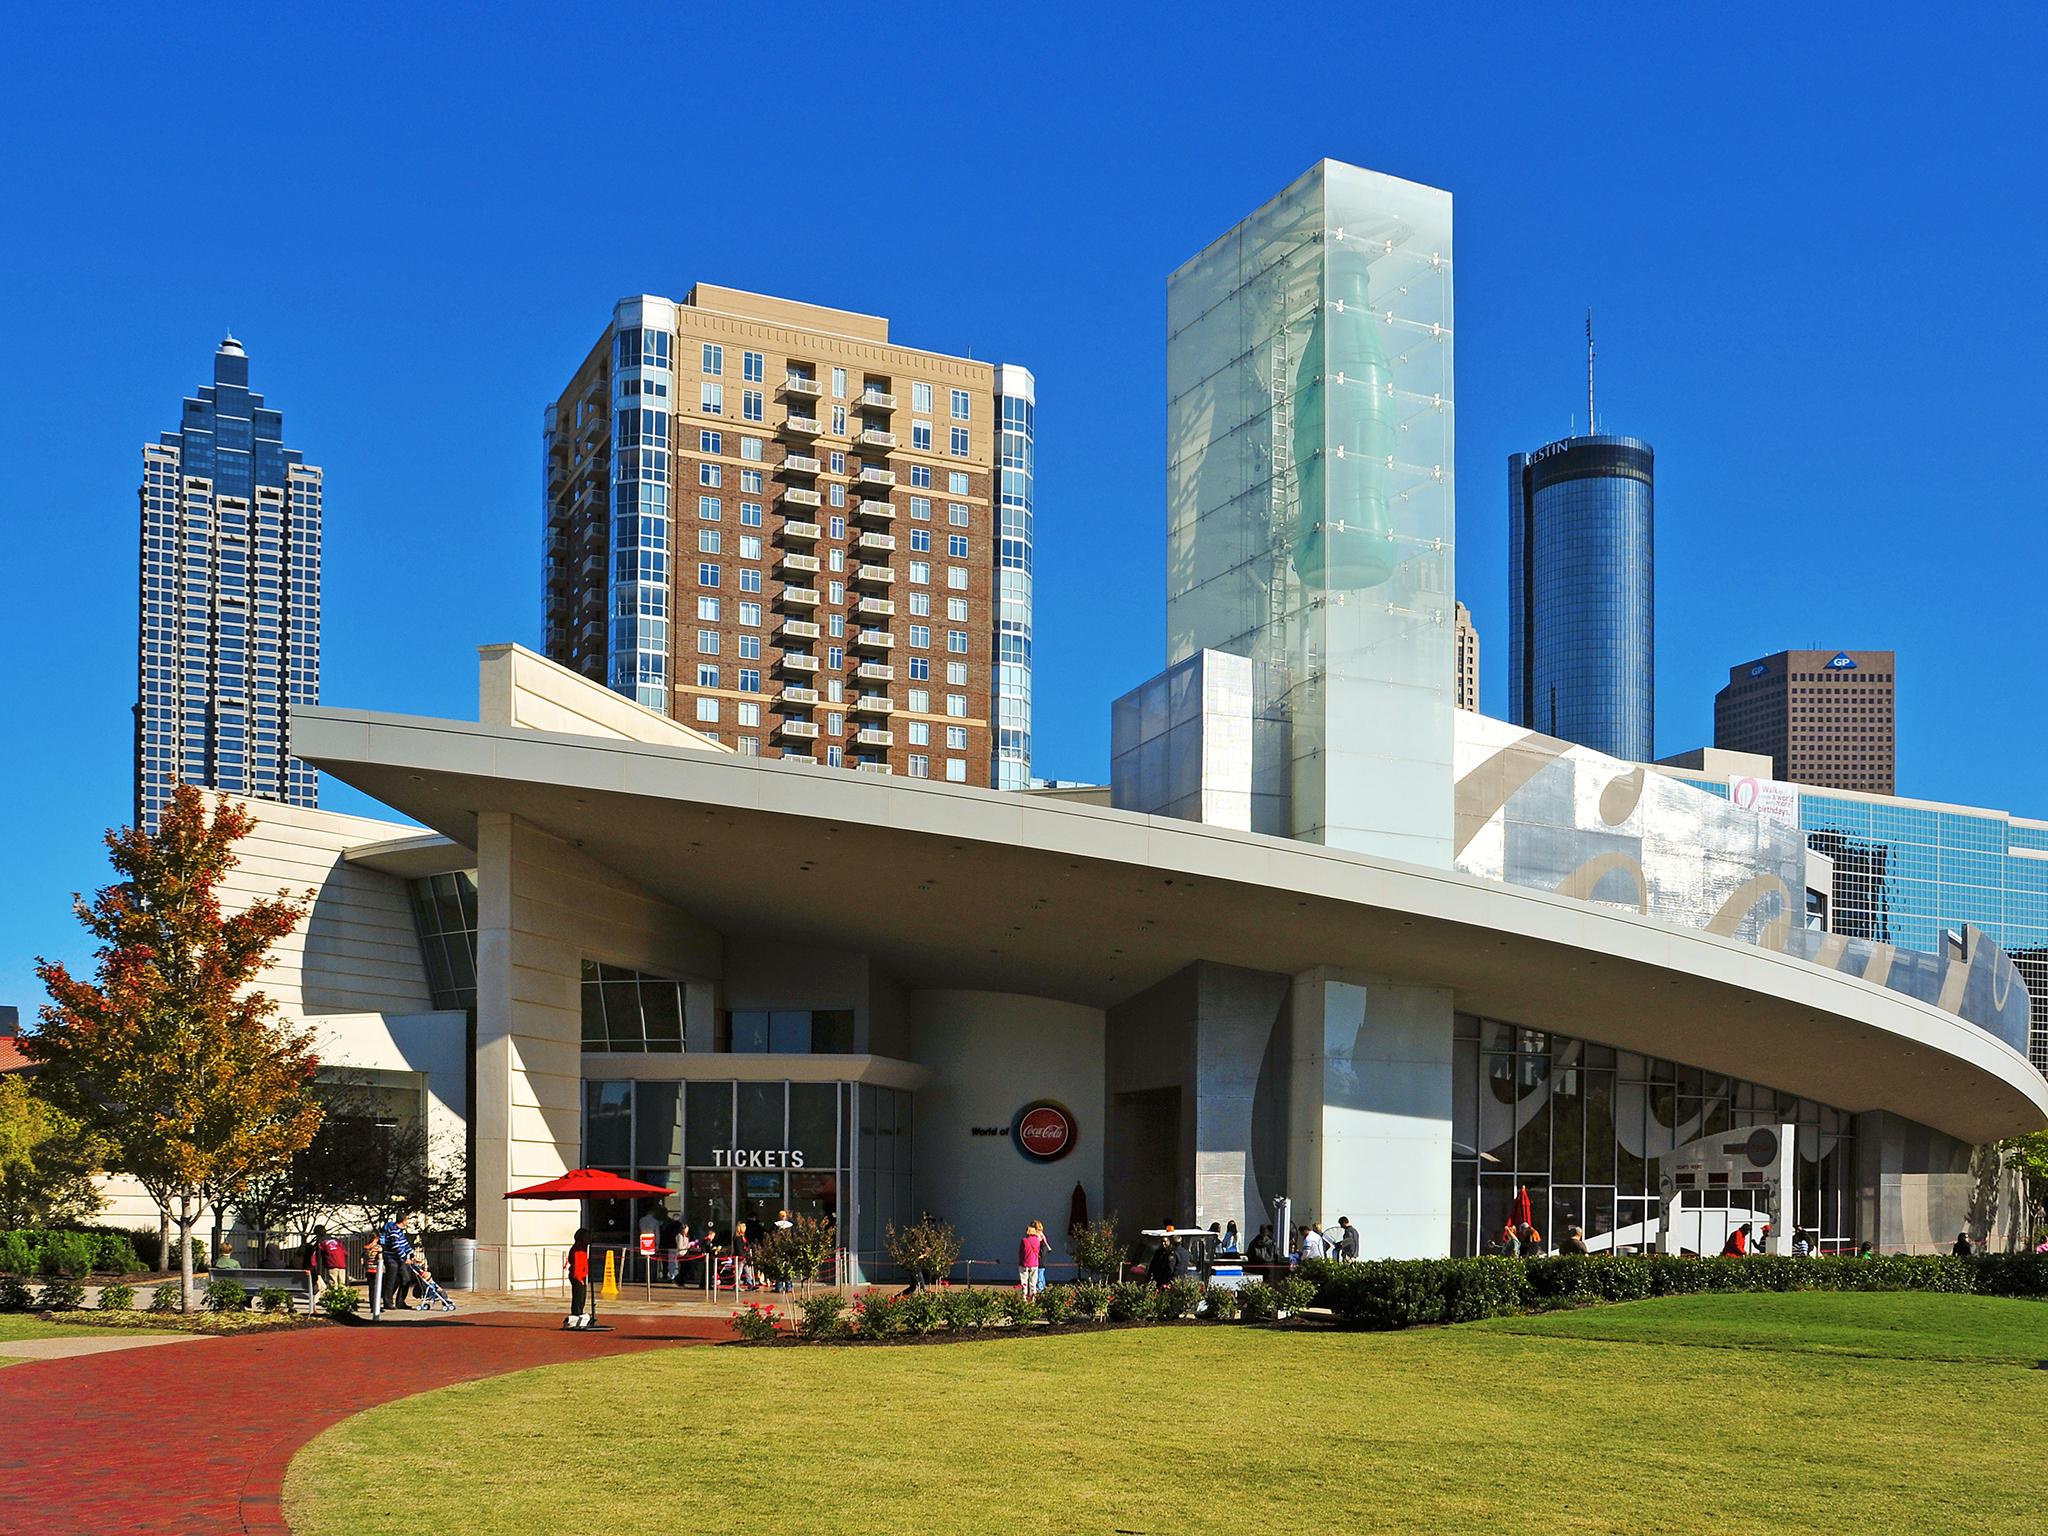 Incredible Atlanta museums to visit